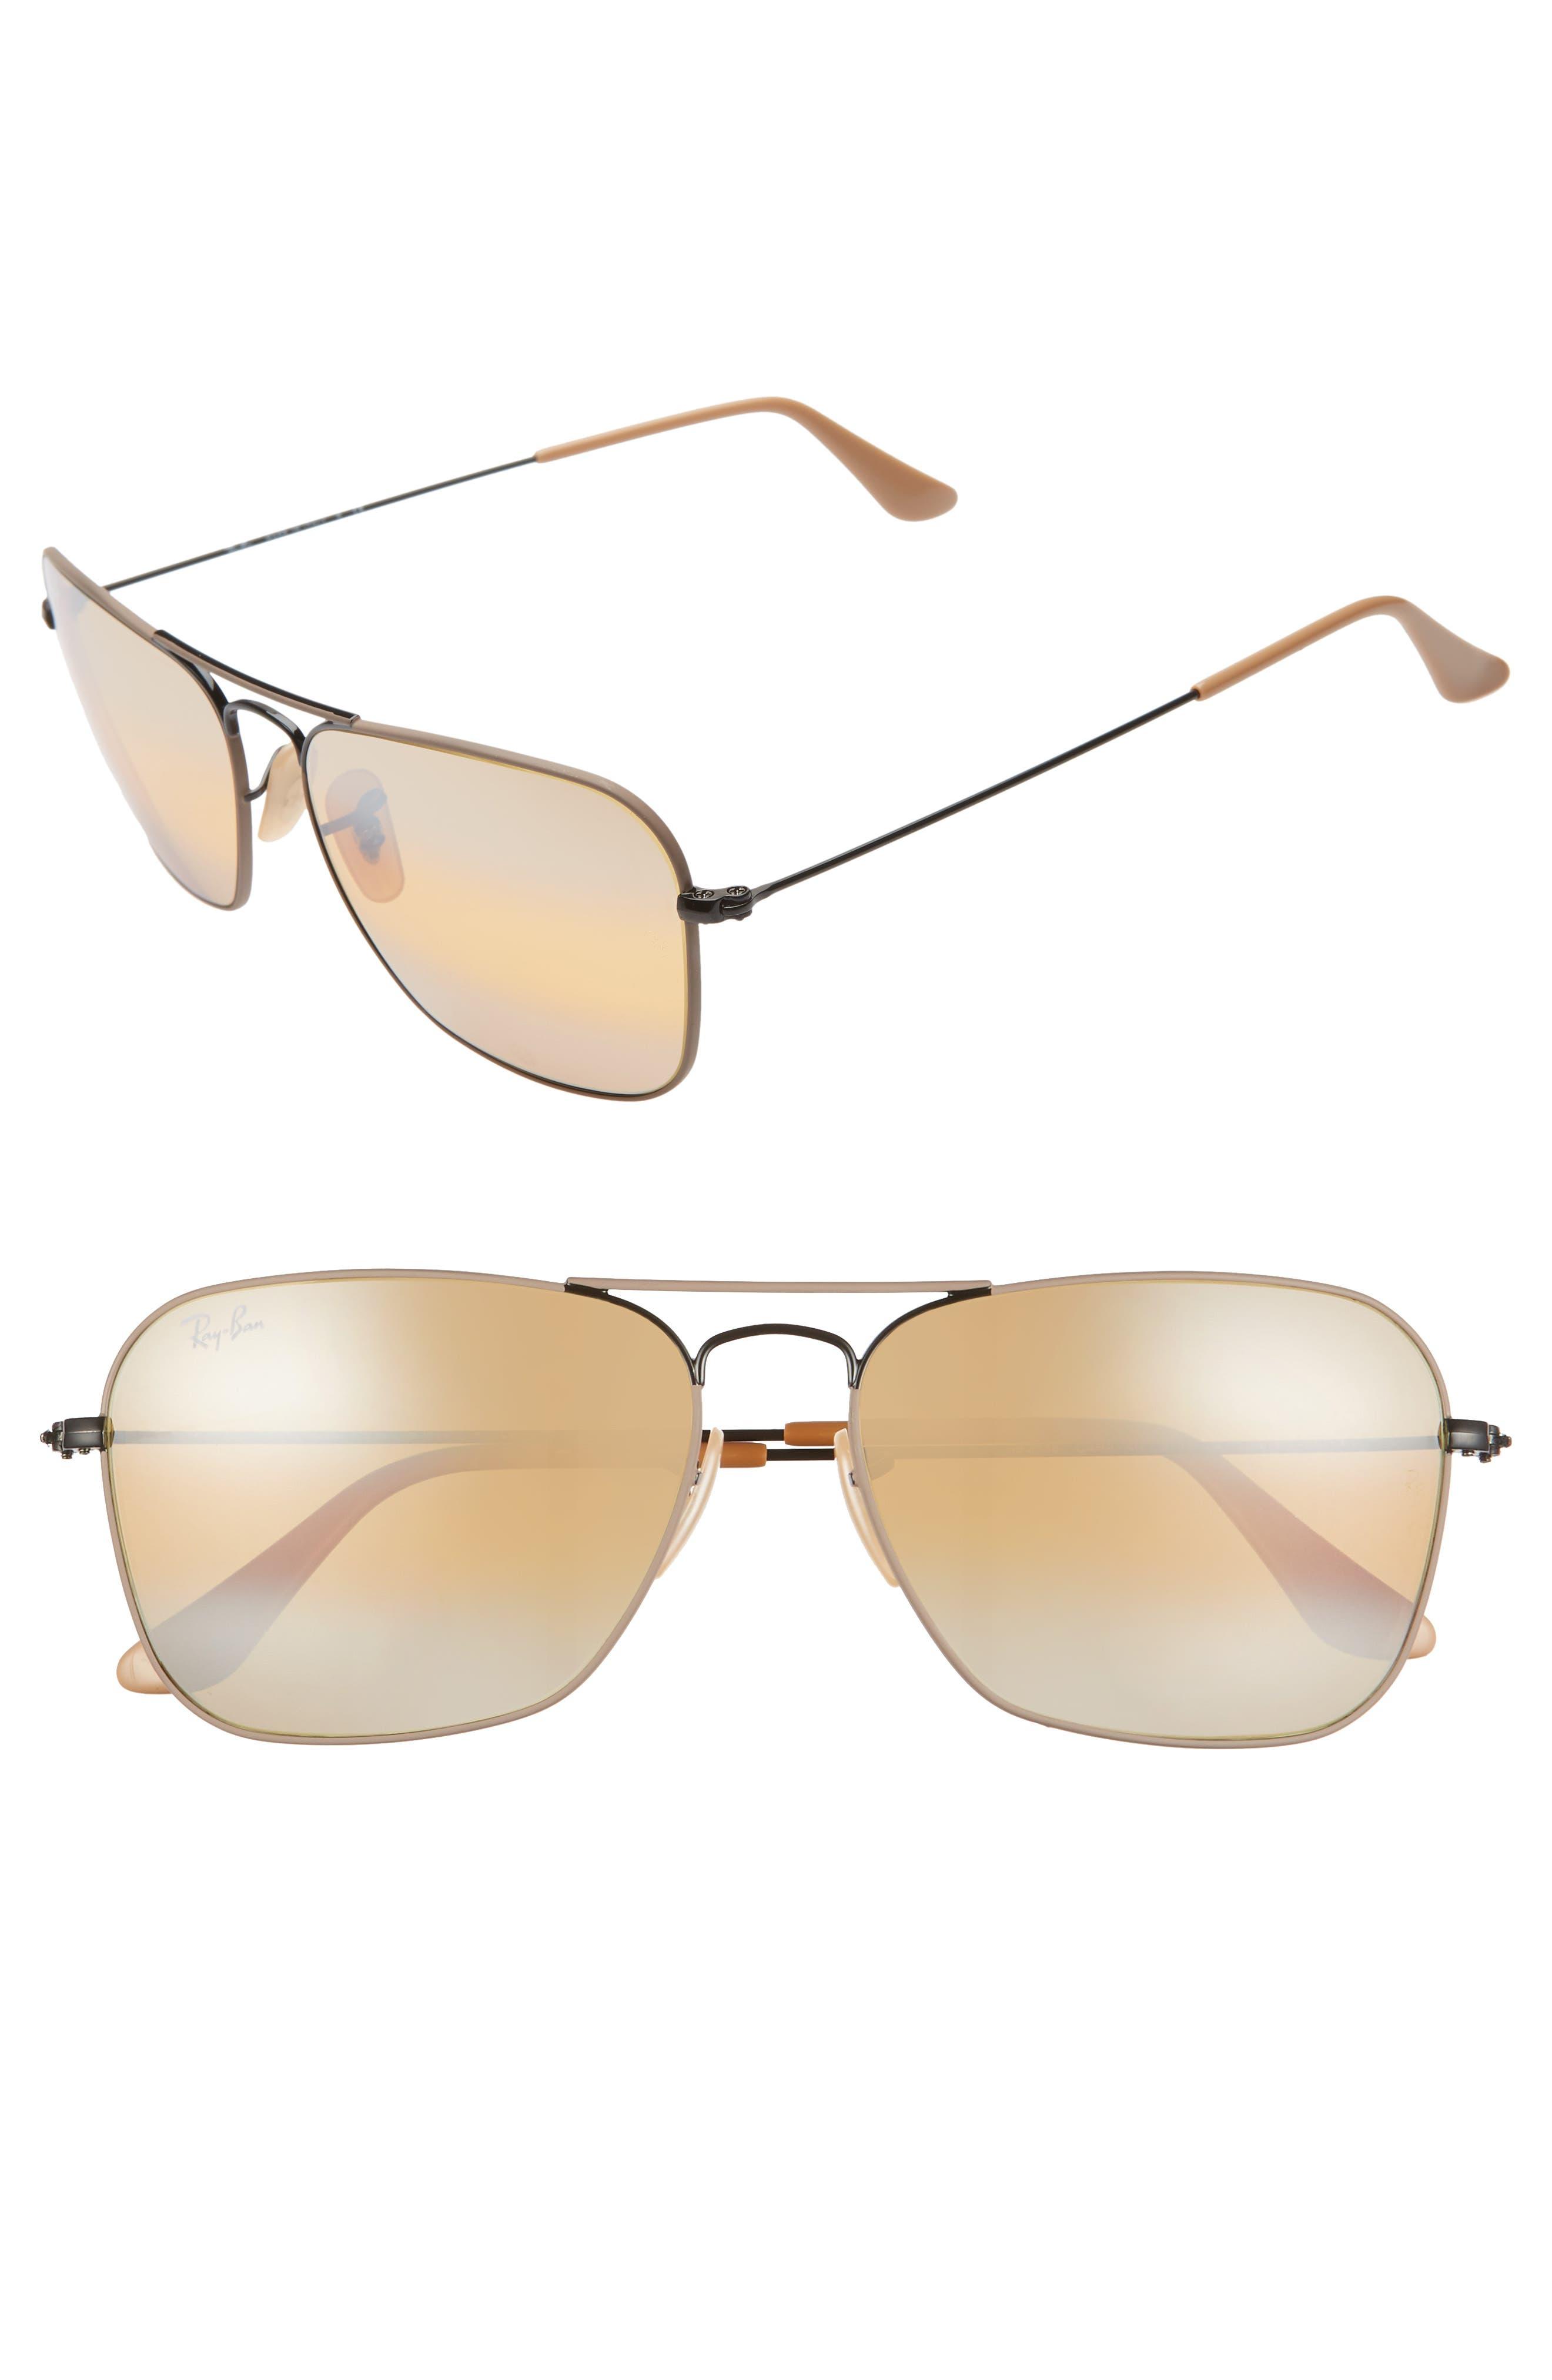 Ray-Ban 5m Aviator Sunglasses - Beige/ Black Mirror